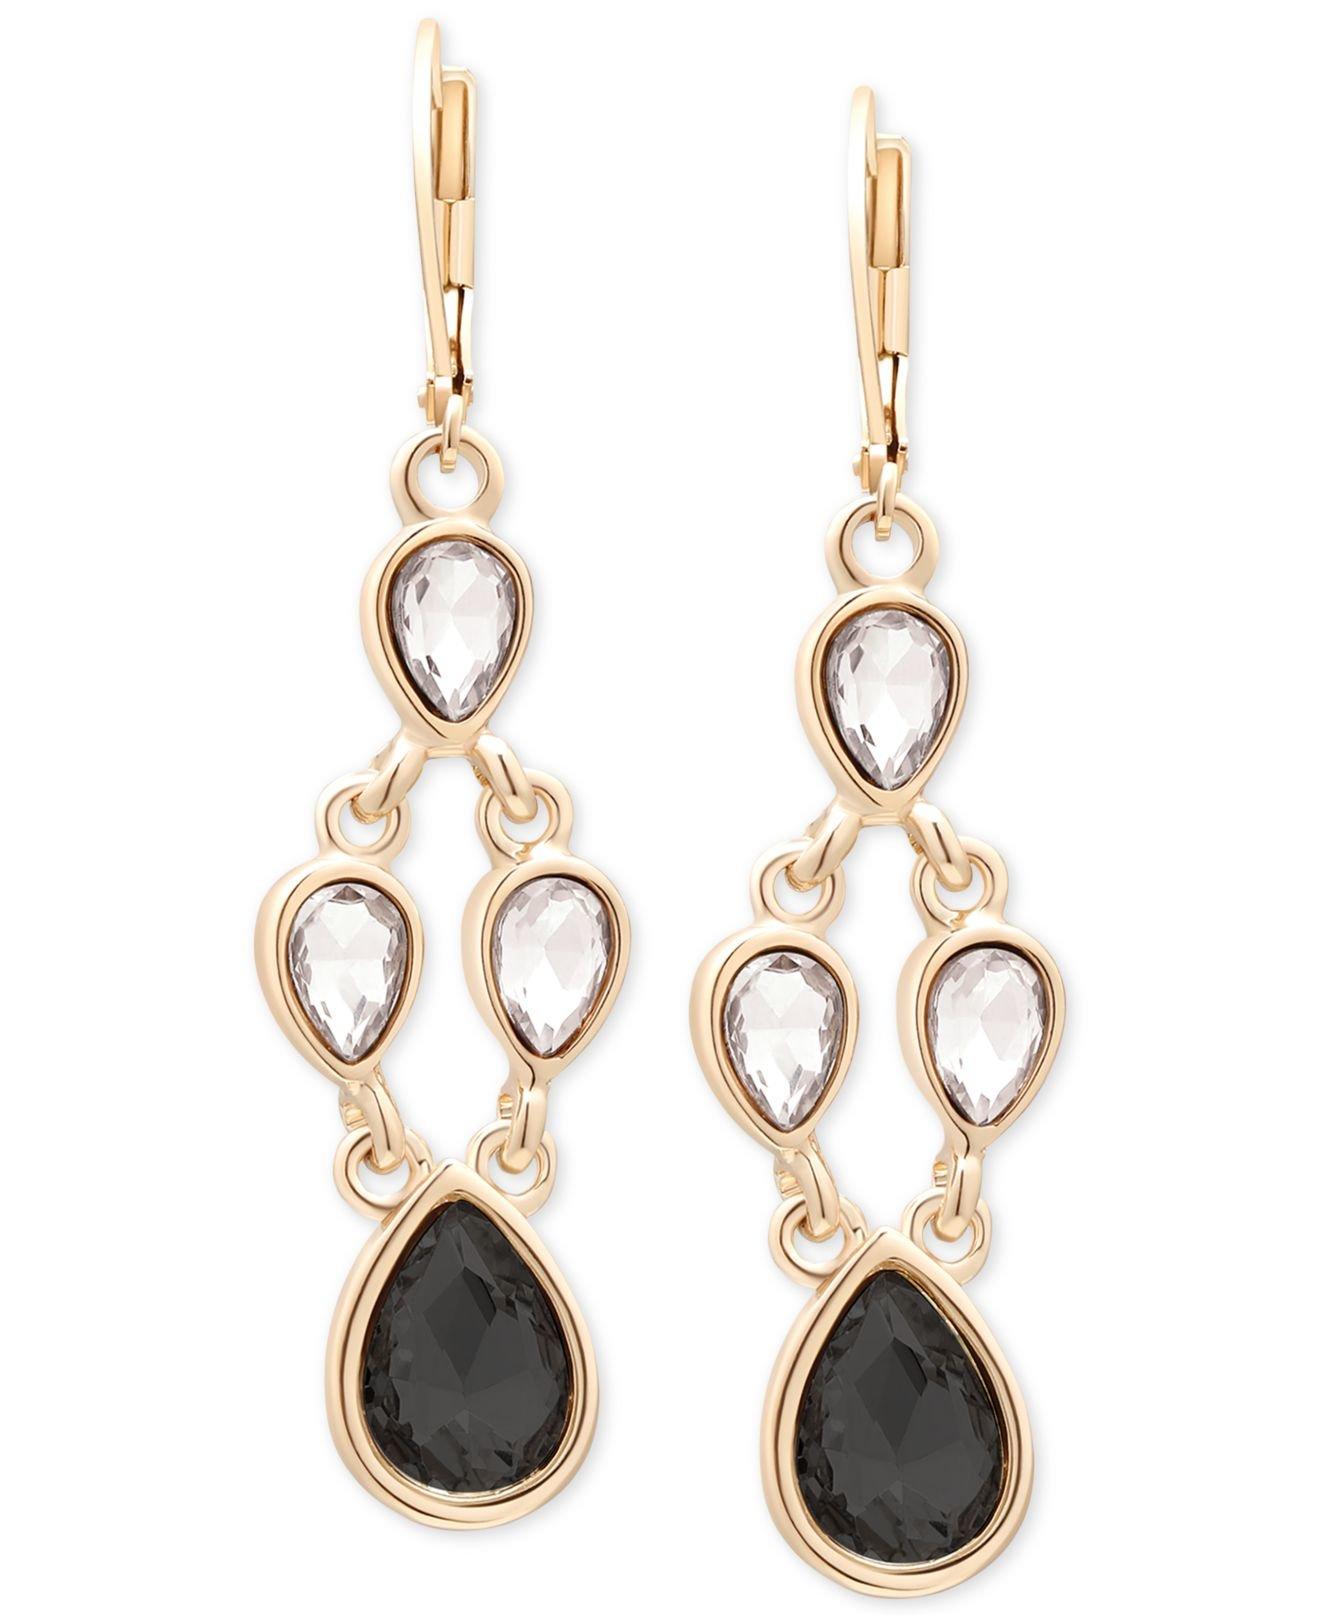 Black Stone Earrings: Tahari T Gold-tone Crystal And Black Stone Chandelier